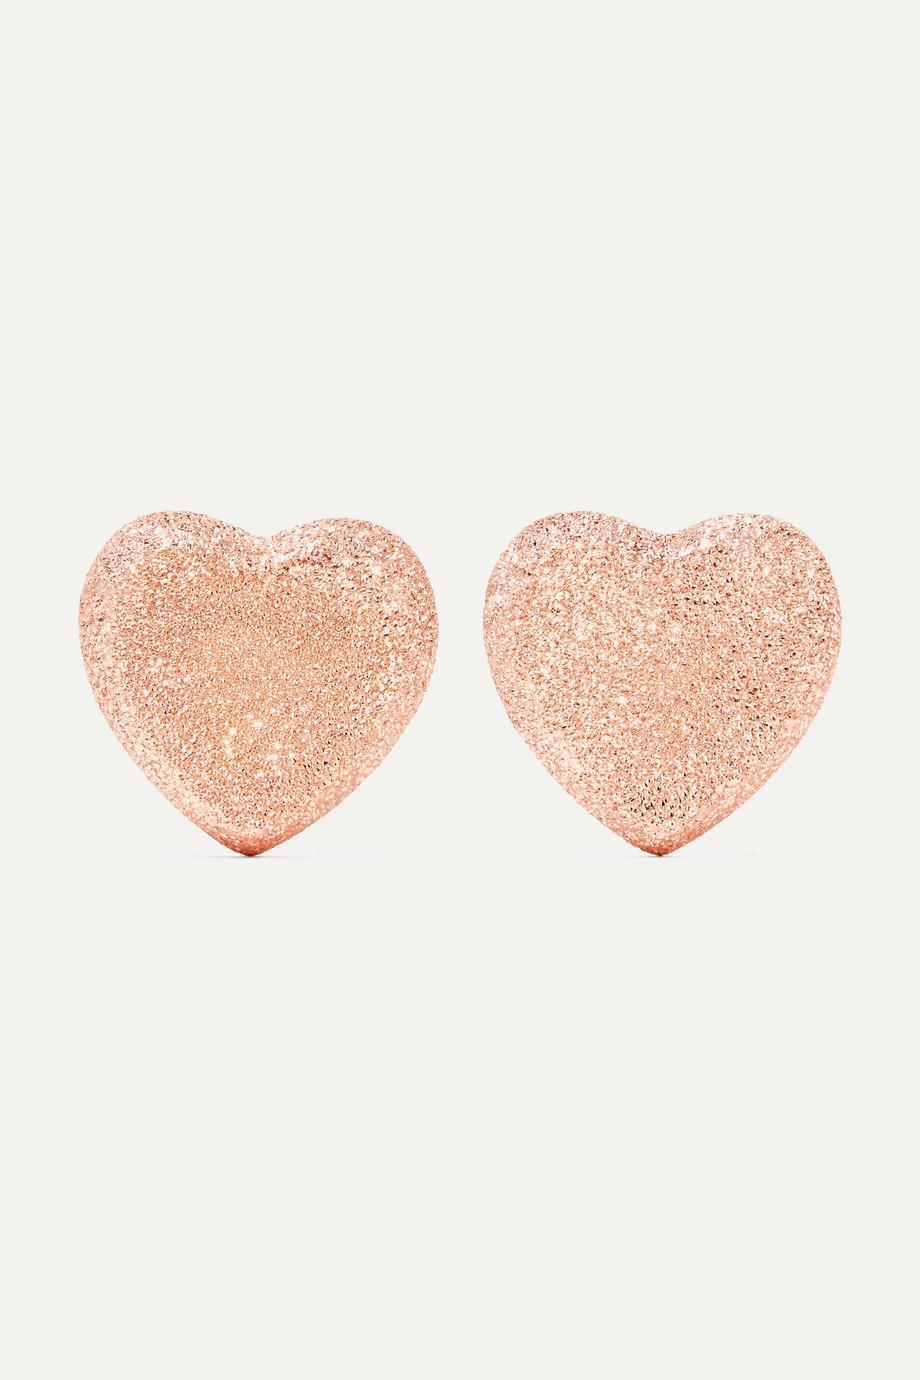 Carolina Bucci Heart Button 18-karat rose gold earrings